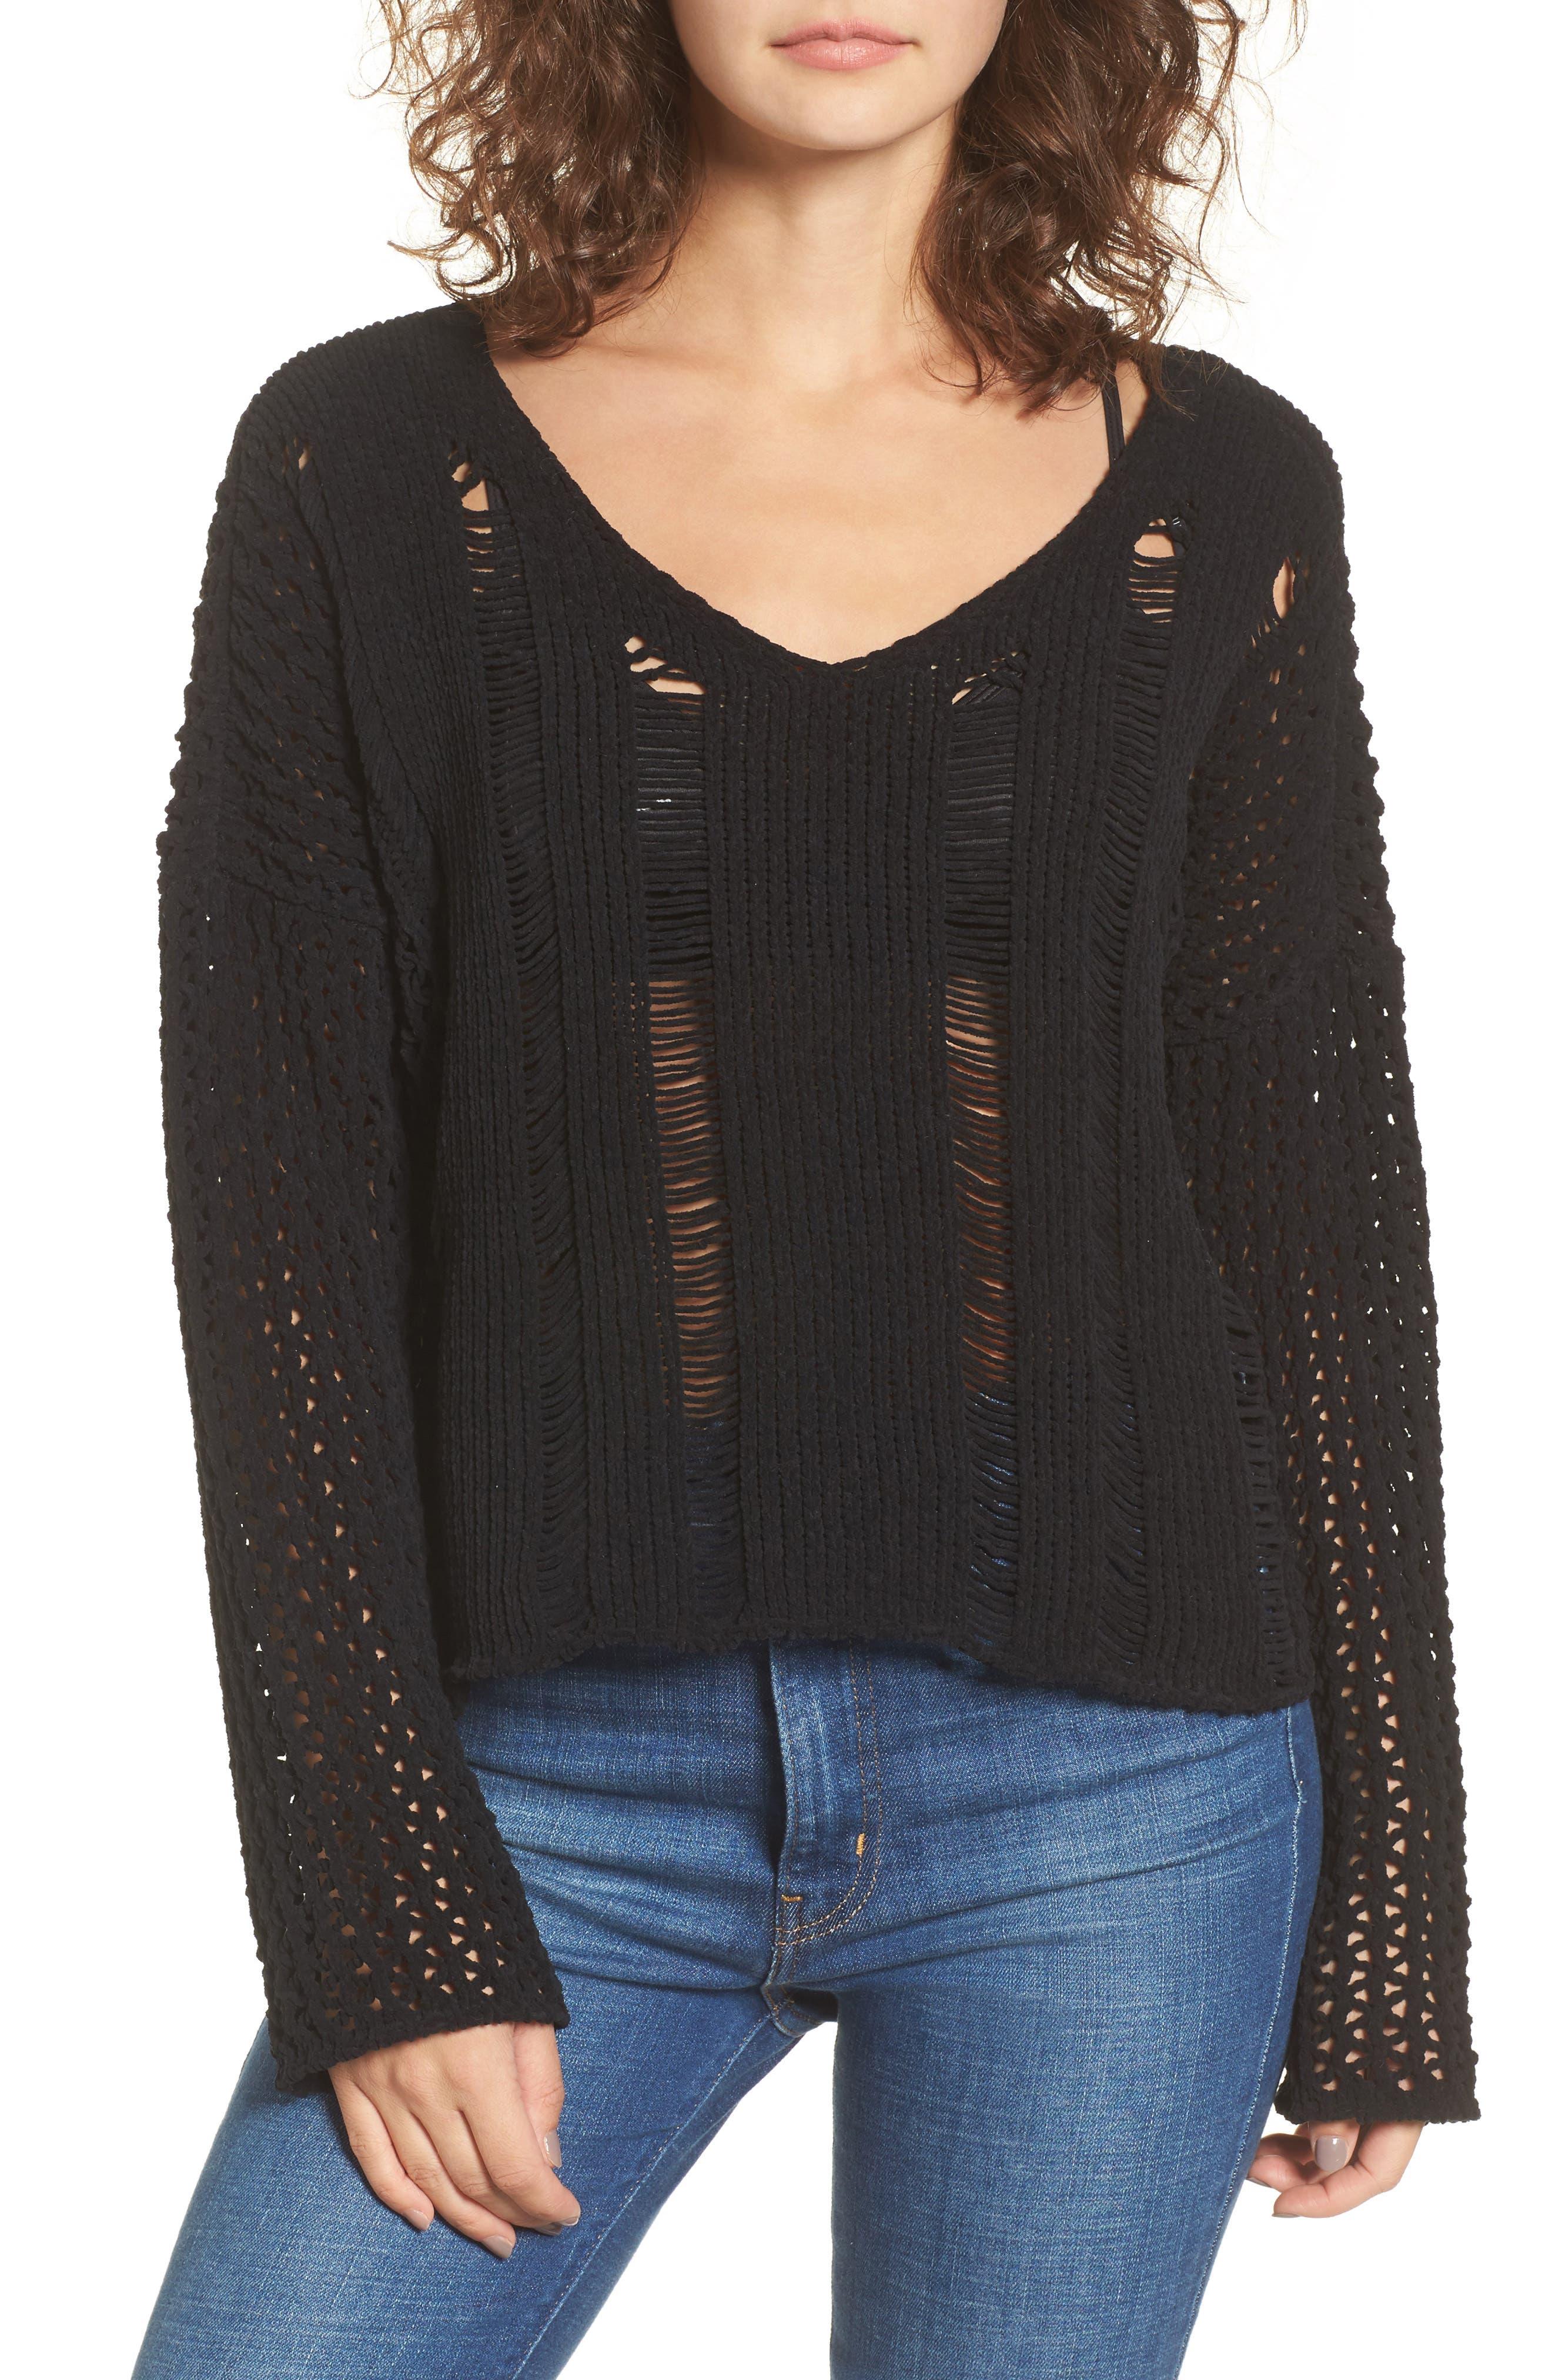 Main Image - MOON RIVER Net Detail Sweater